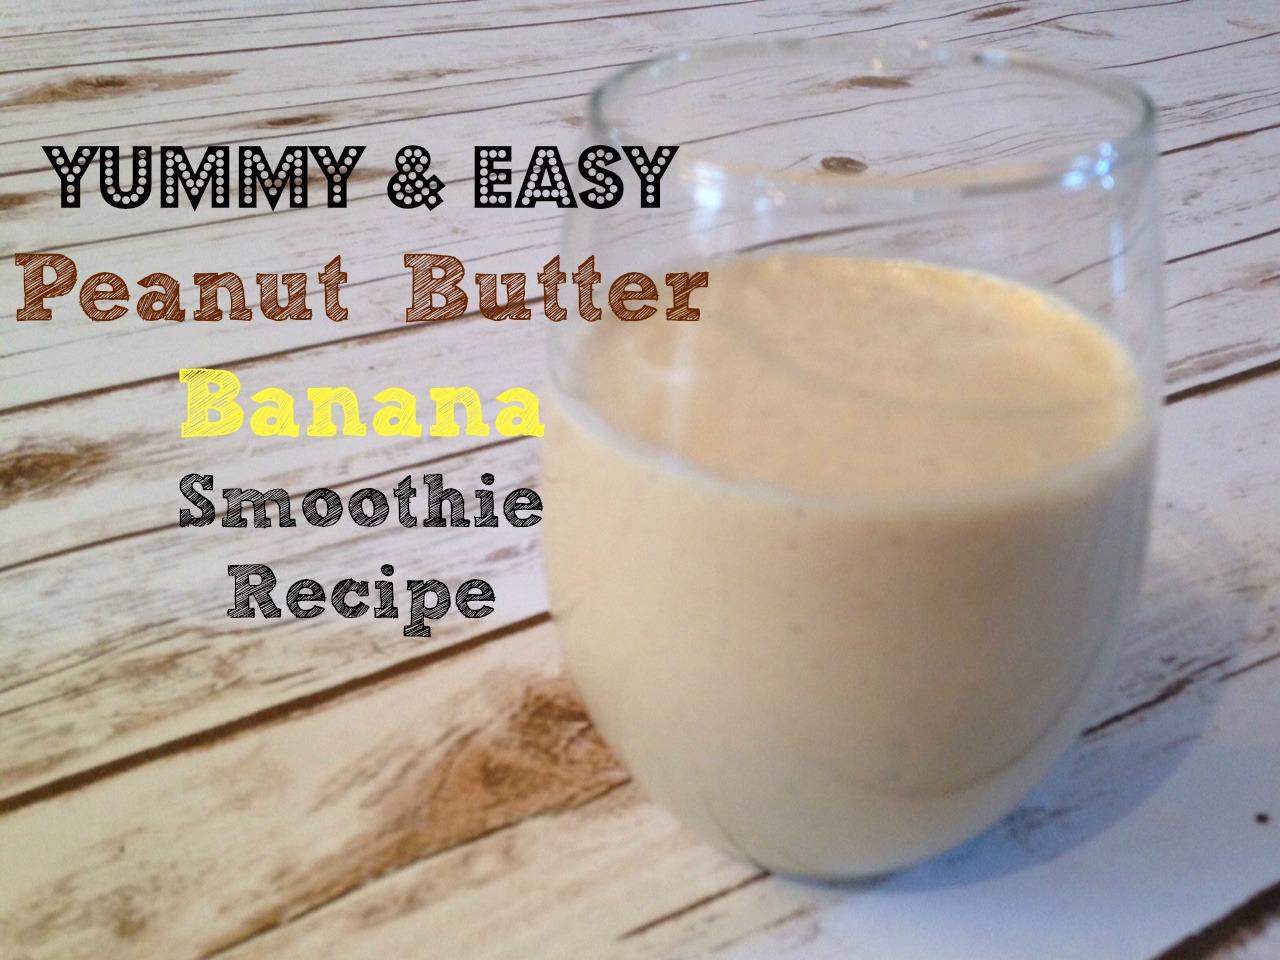 Easy Peanut Butter Banana Smoothie Recipe